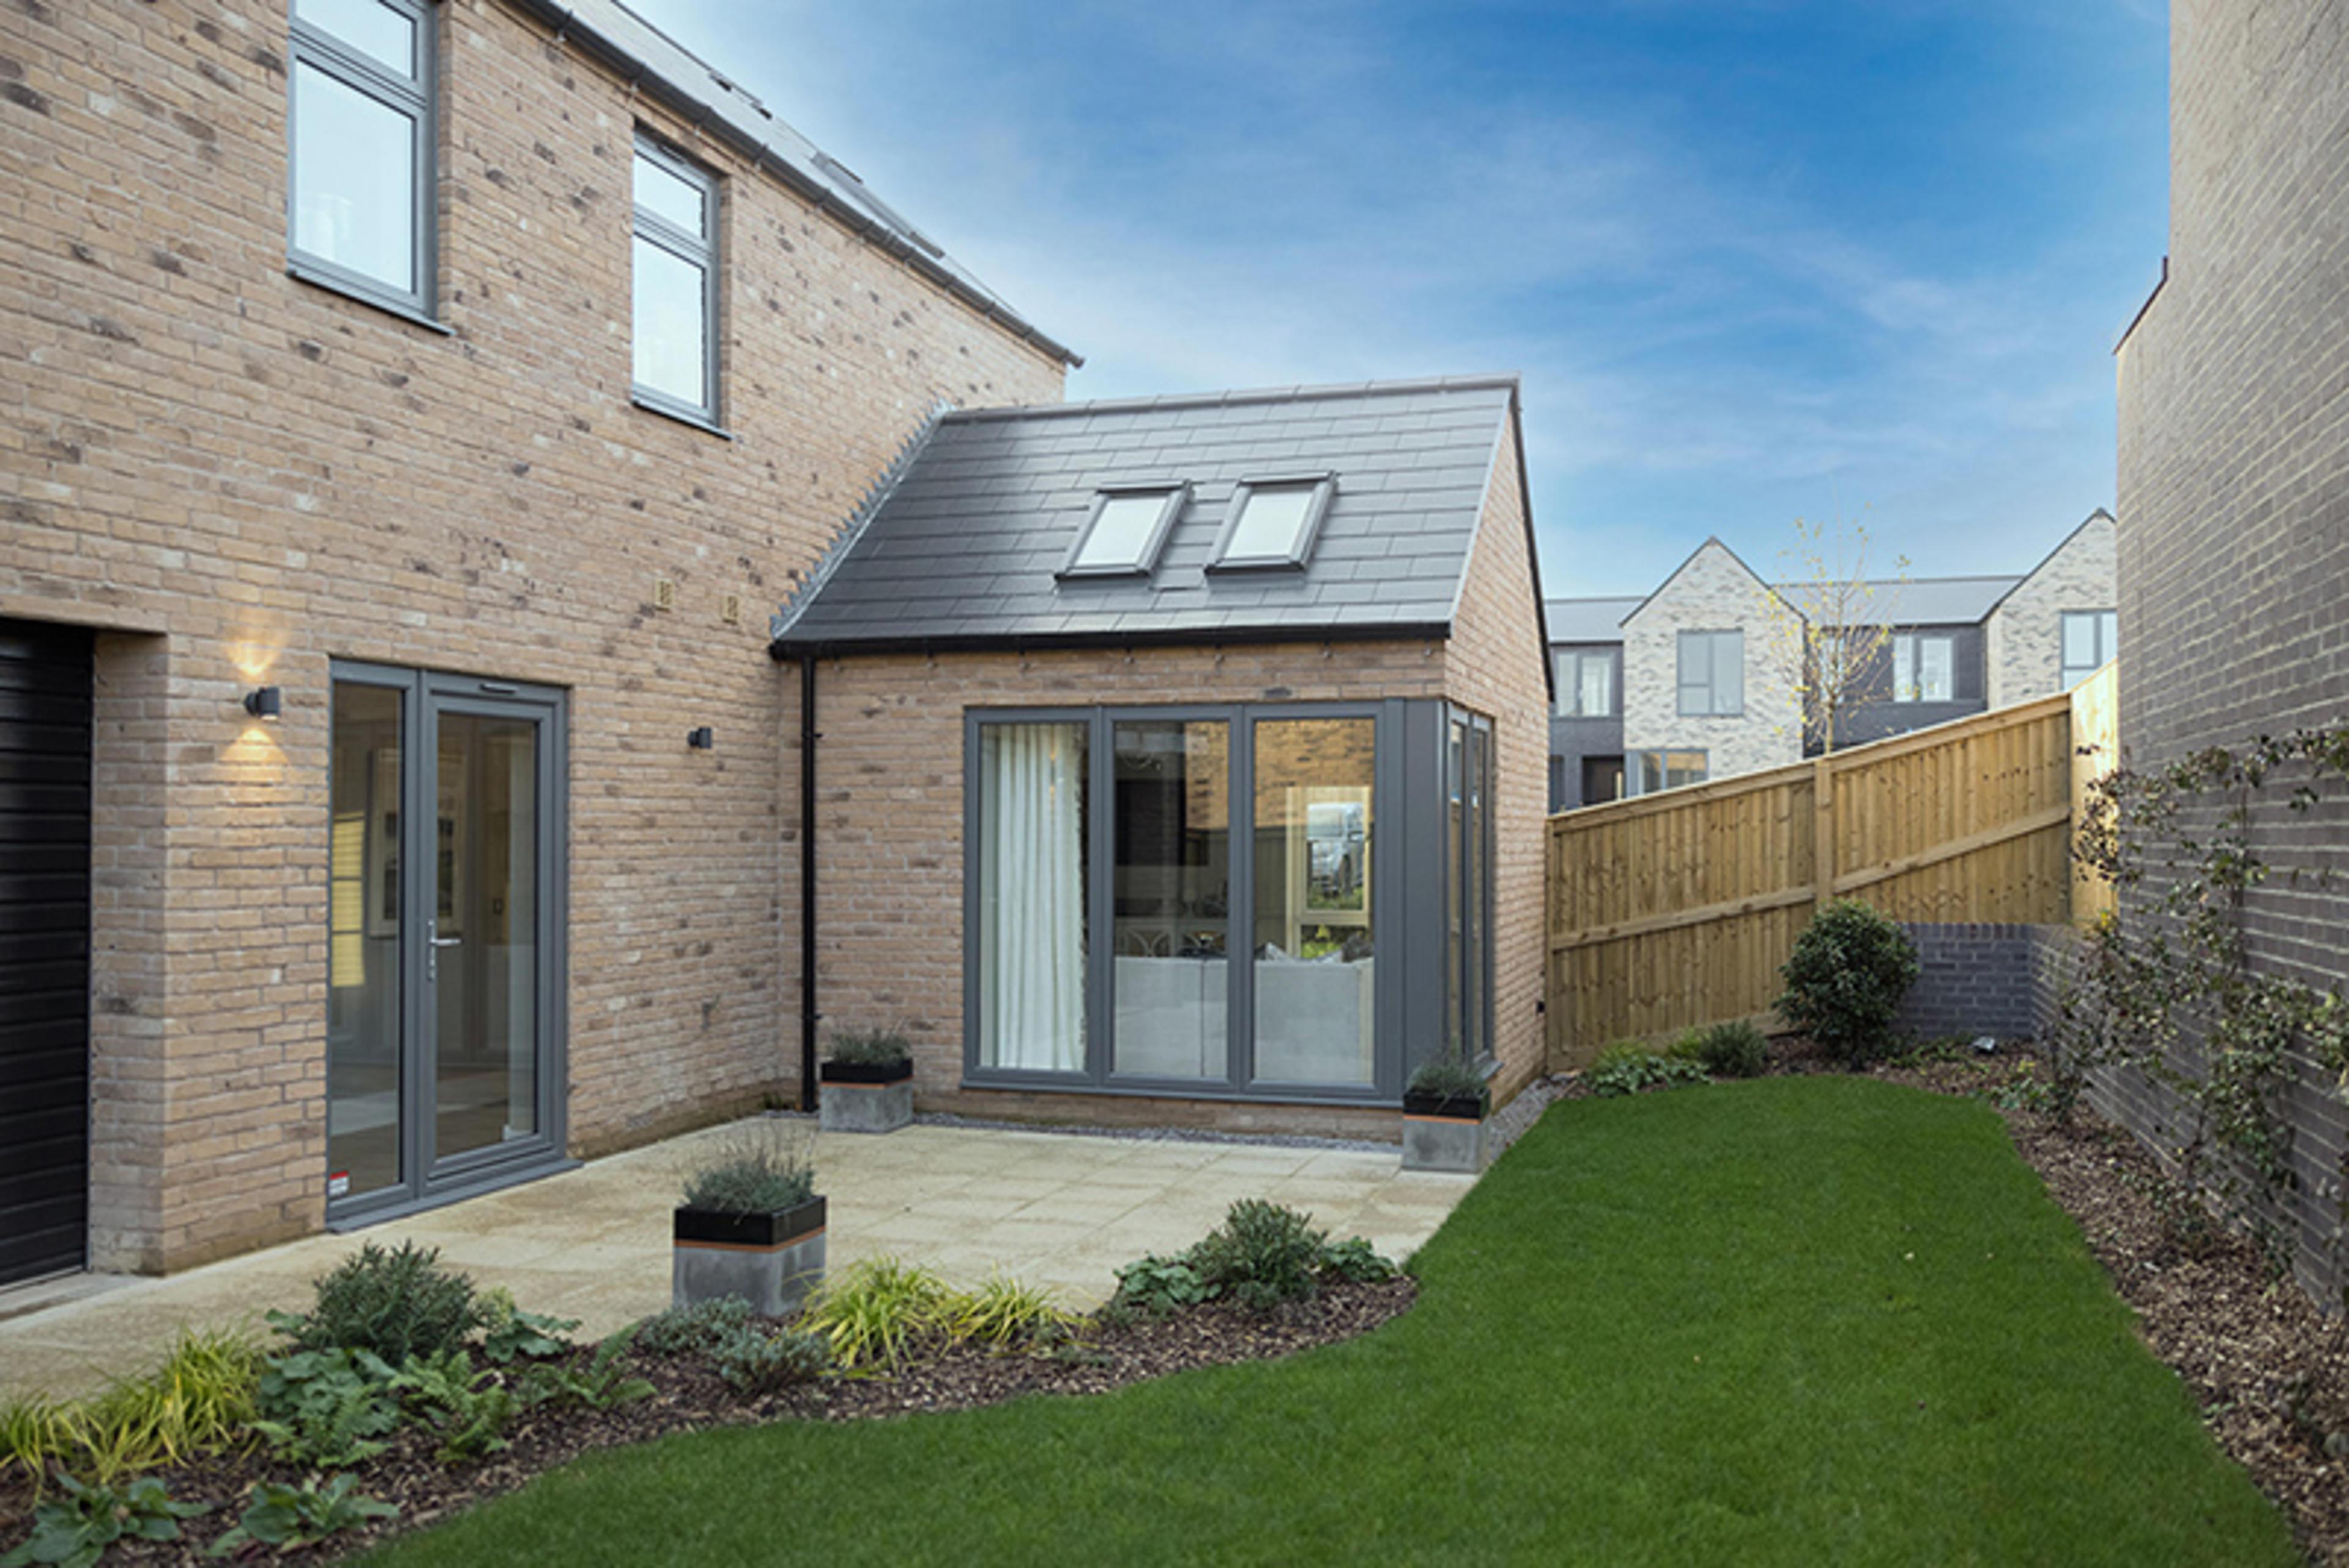 watling-grange-harrogate-calder-3-bed-home-rear-garden-1